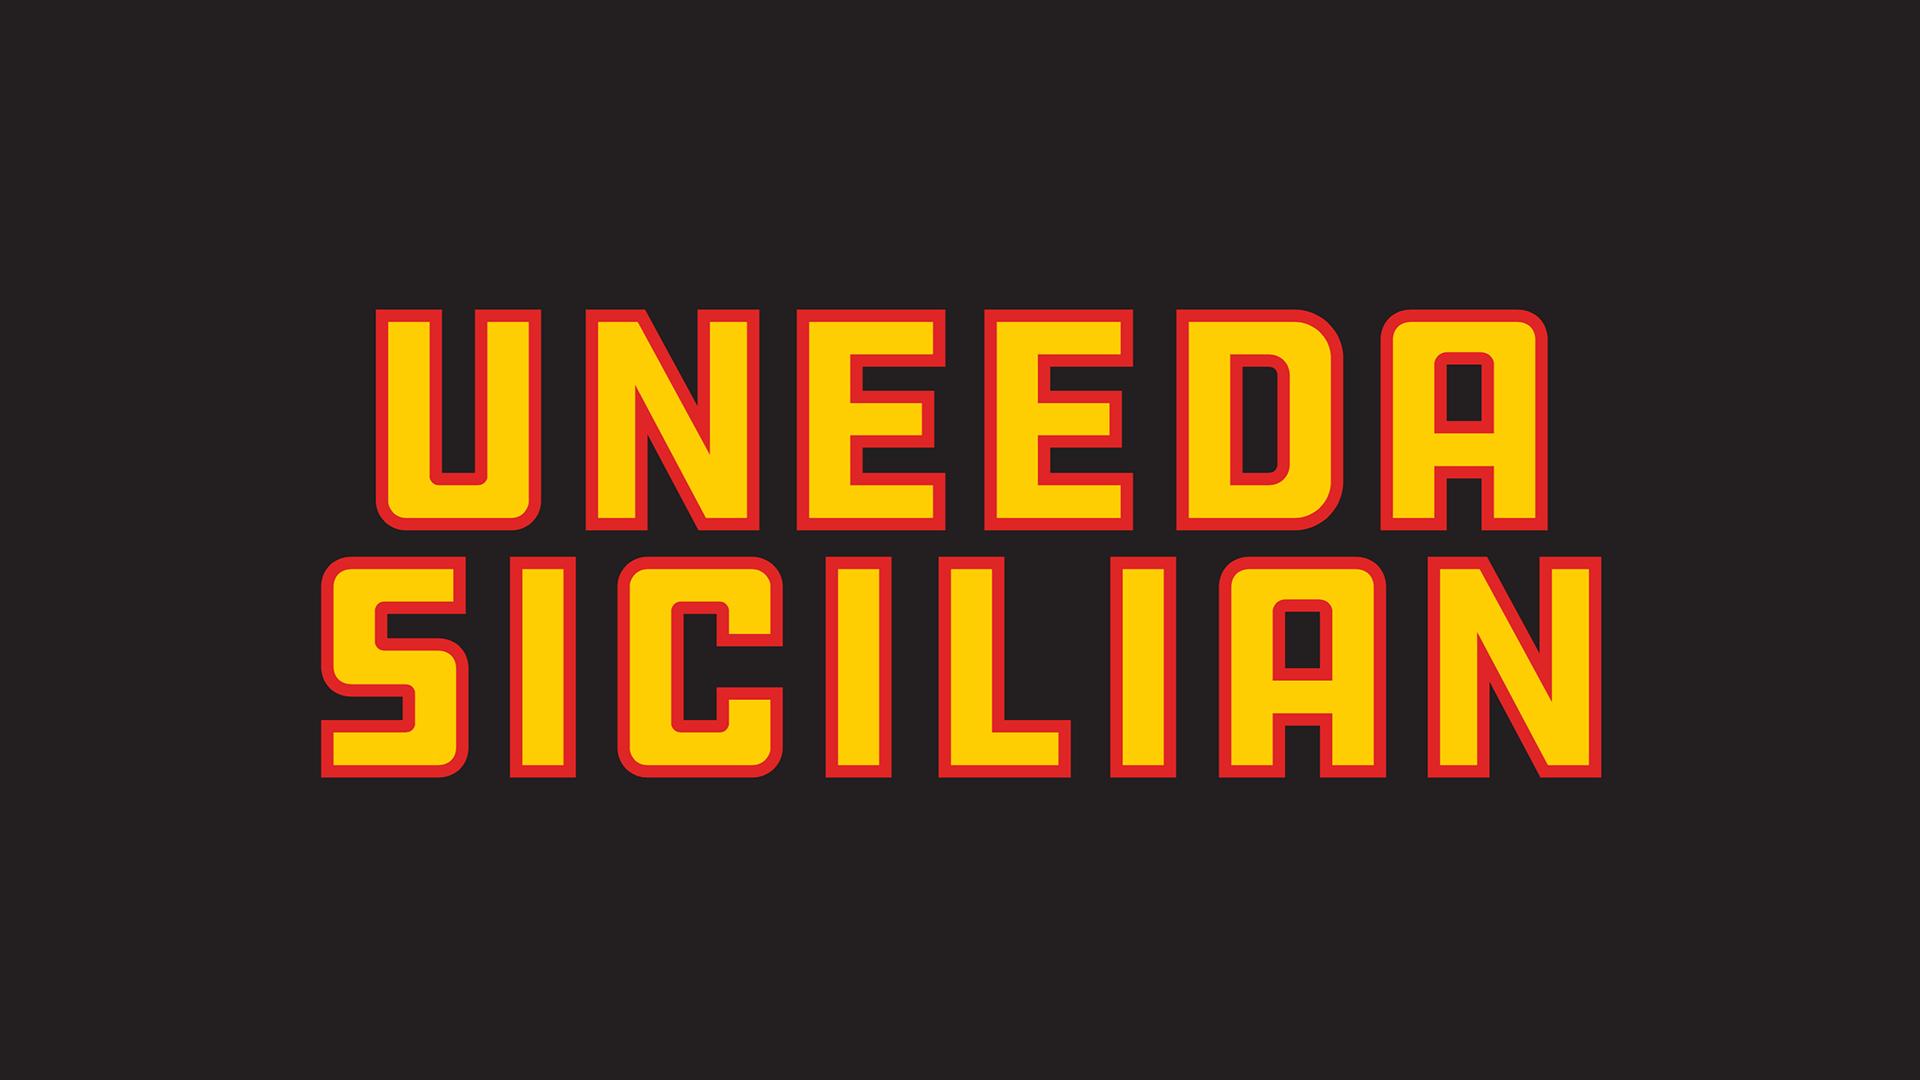 uneeda banner image black - 1.png